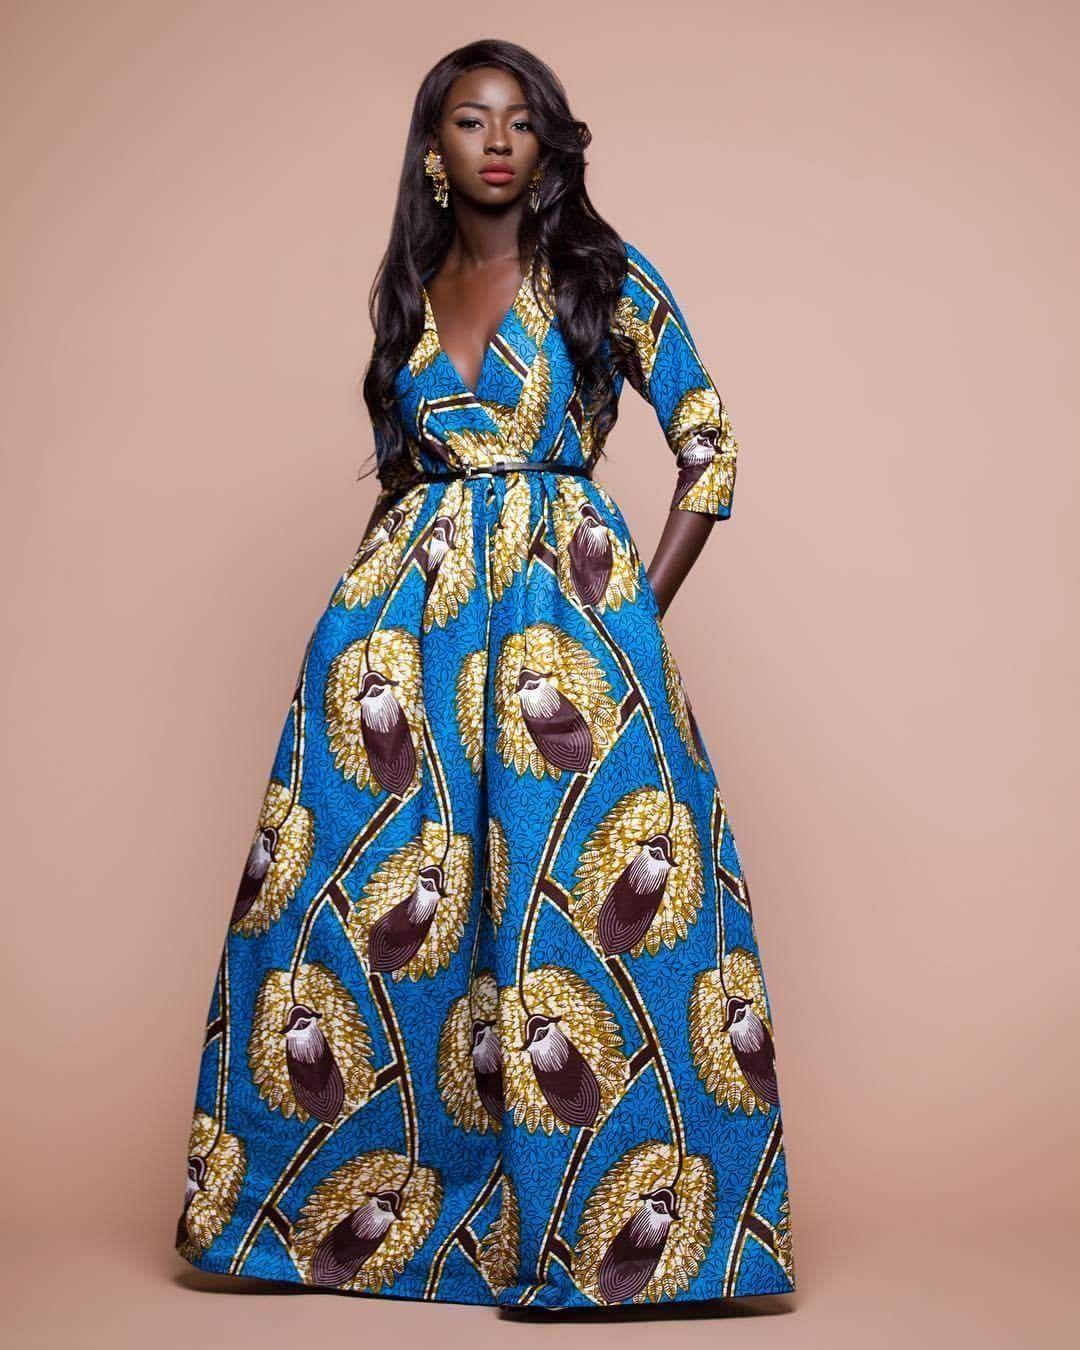 Pin de Isaiah Merriweather en African Fashion | Pinterest